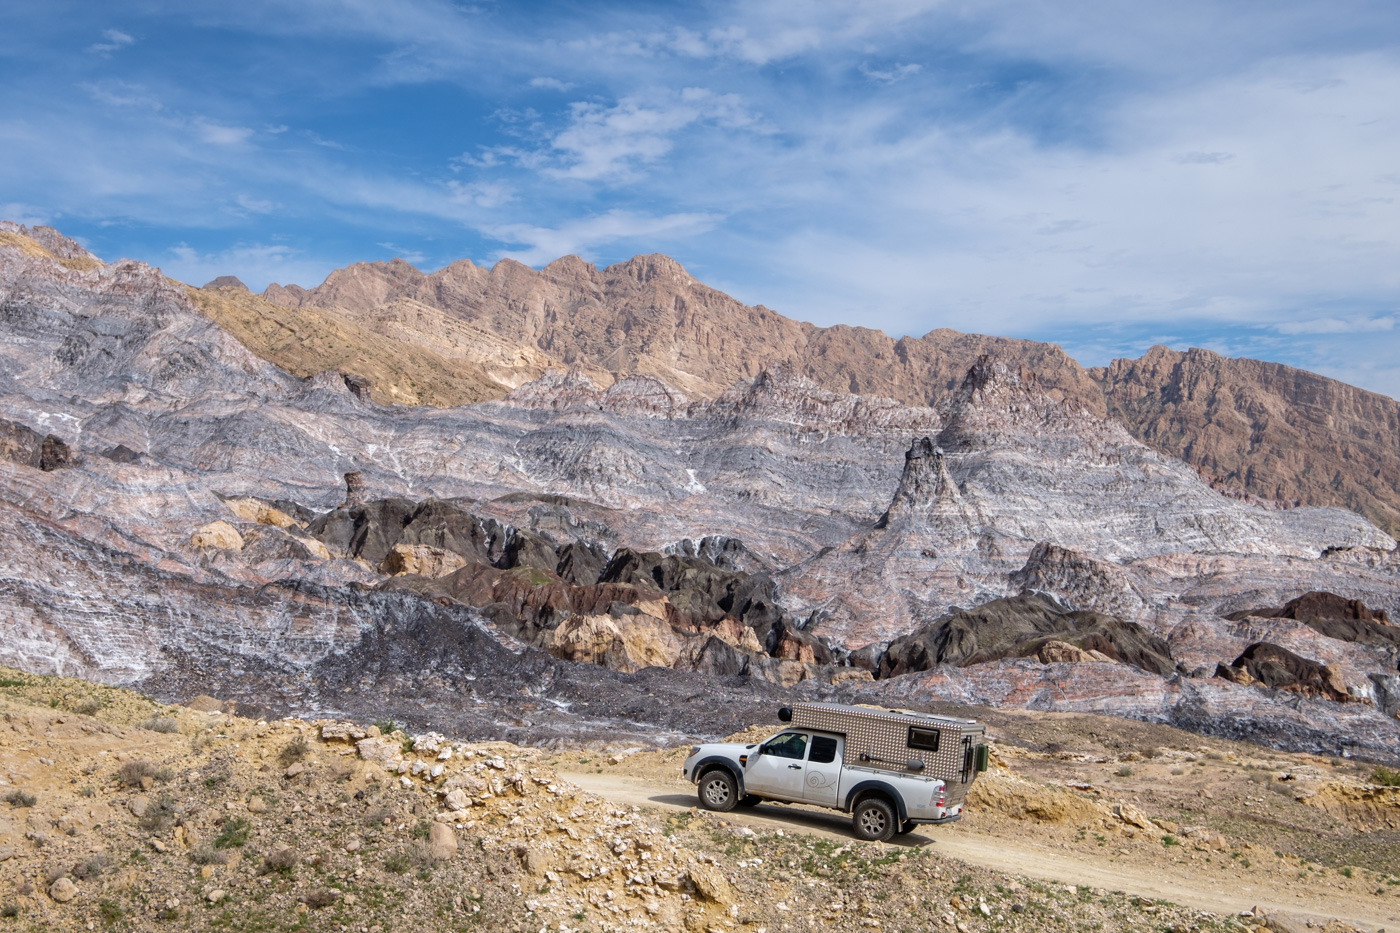 Iran abseits der Hauptrouten - (6) Busher Provinz, Jashak Salzdom (Kuh-e Namak)